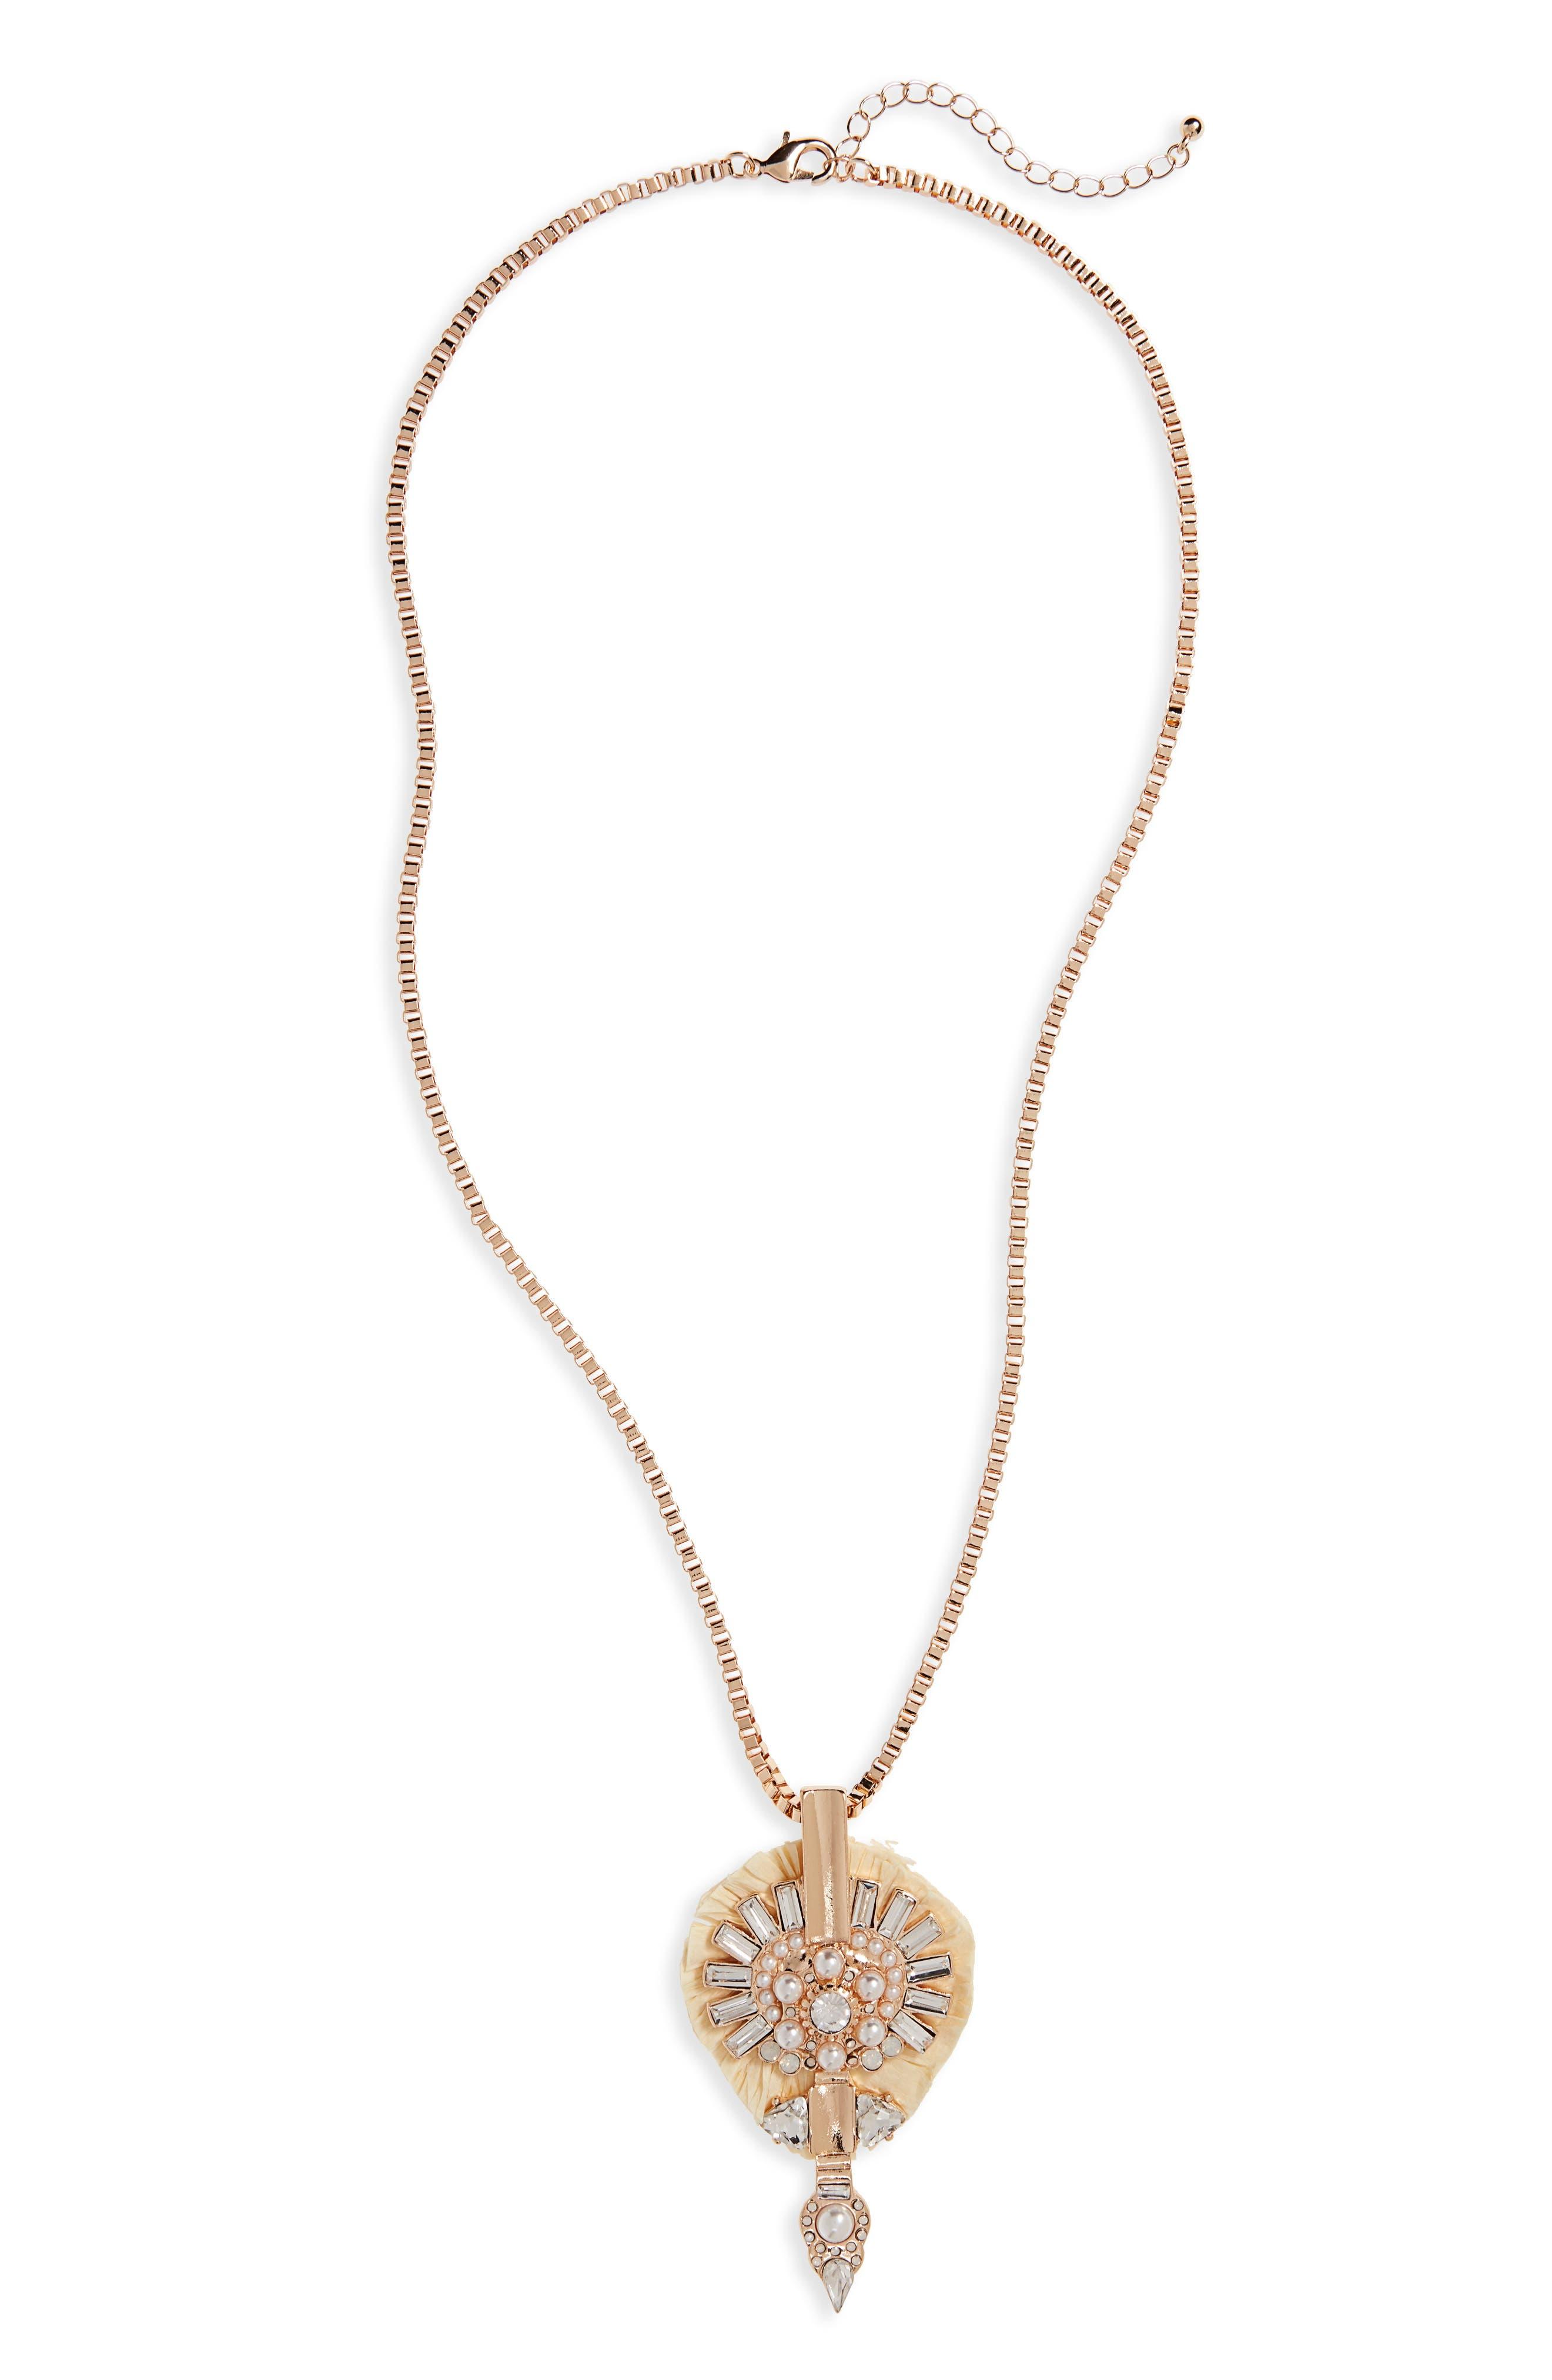 Brooch Pendant,                             Main thumbnail 1, color,                             Gold/ Cream/ Pearl